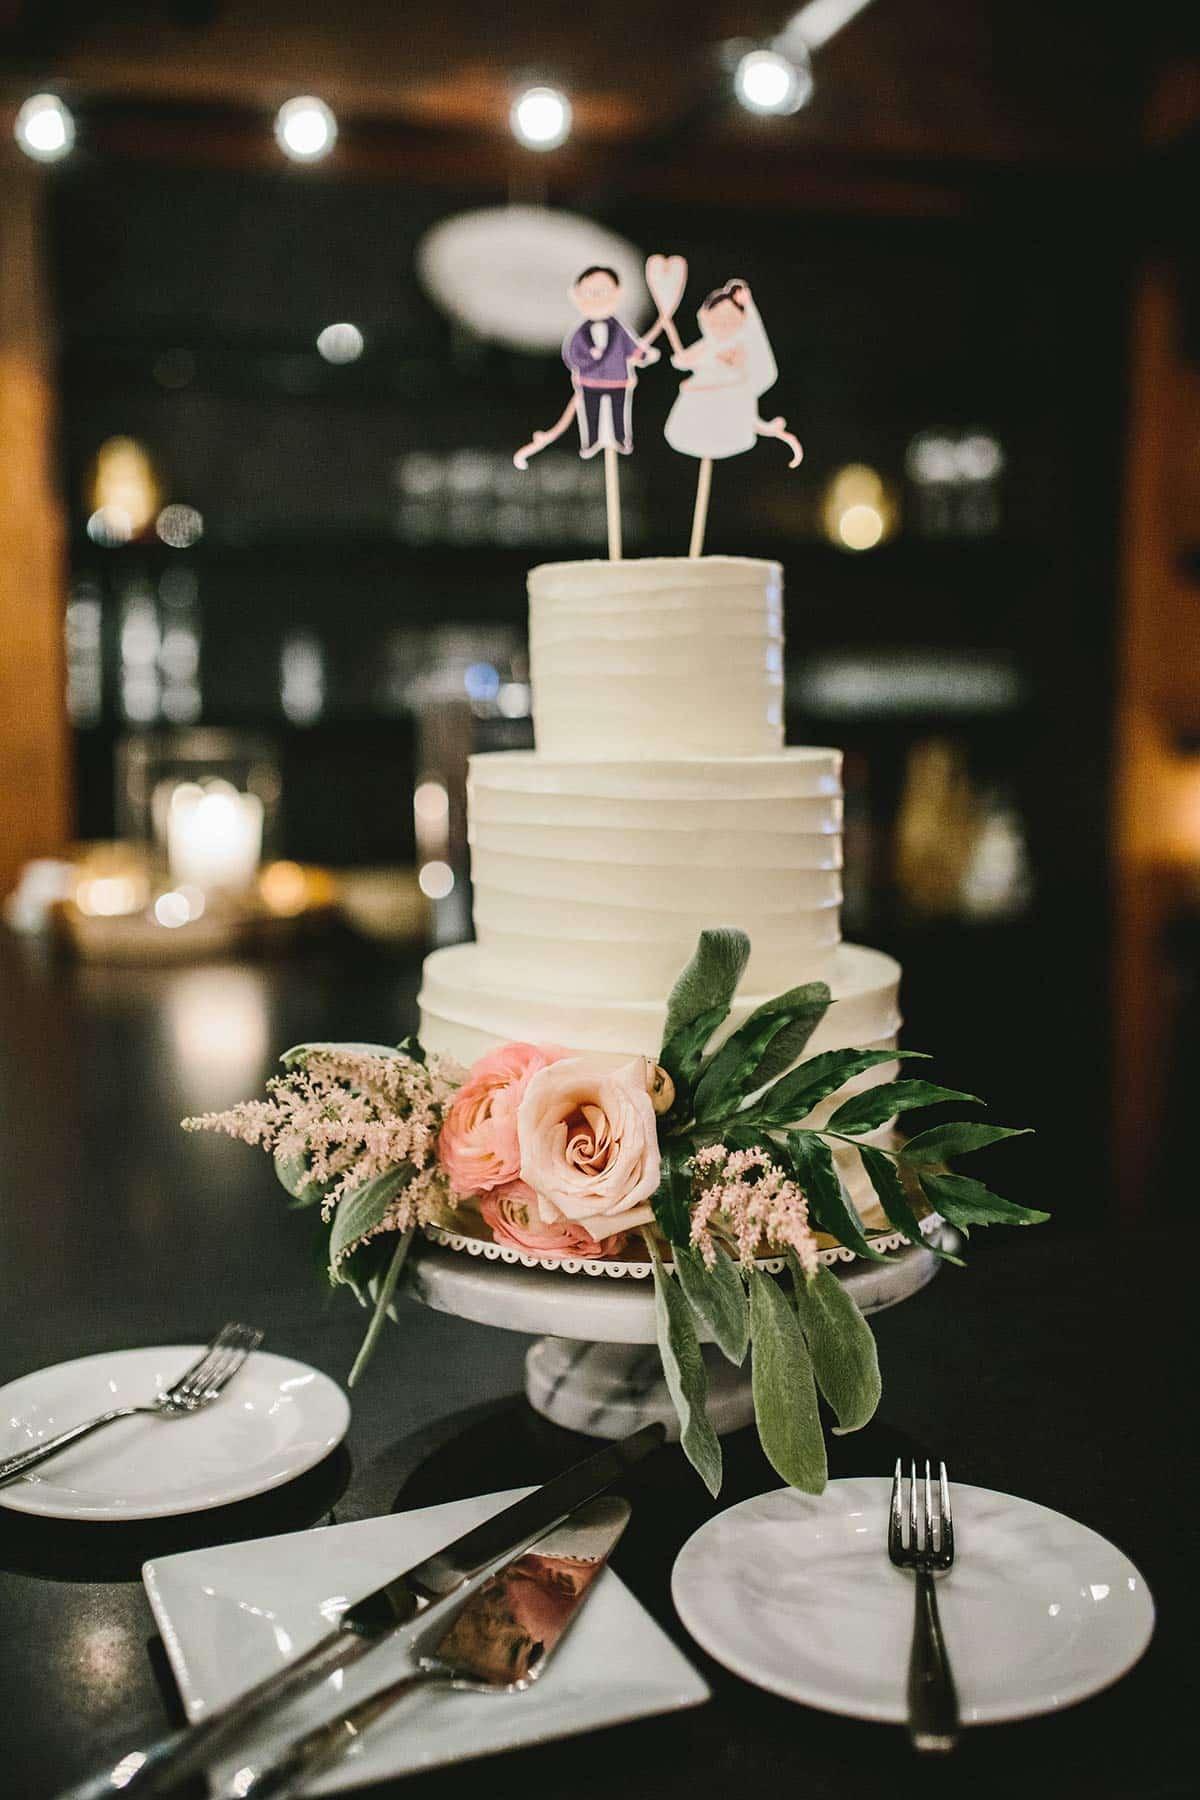 Custom celebration cake with flowers